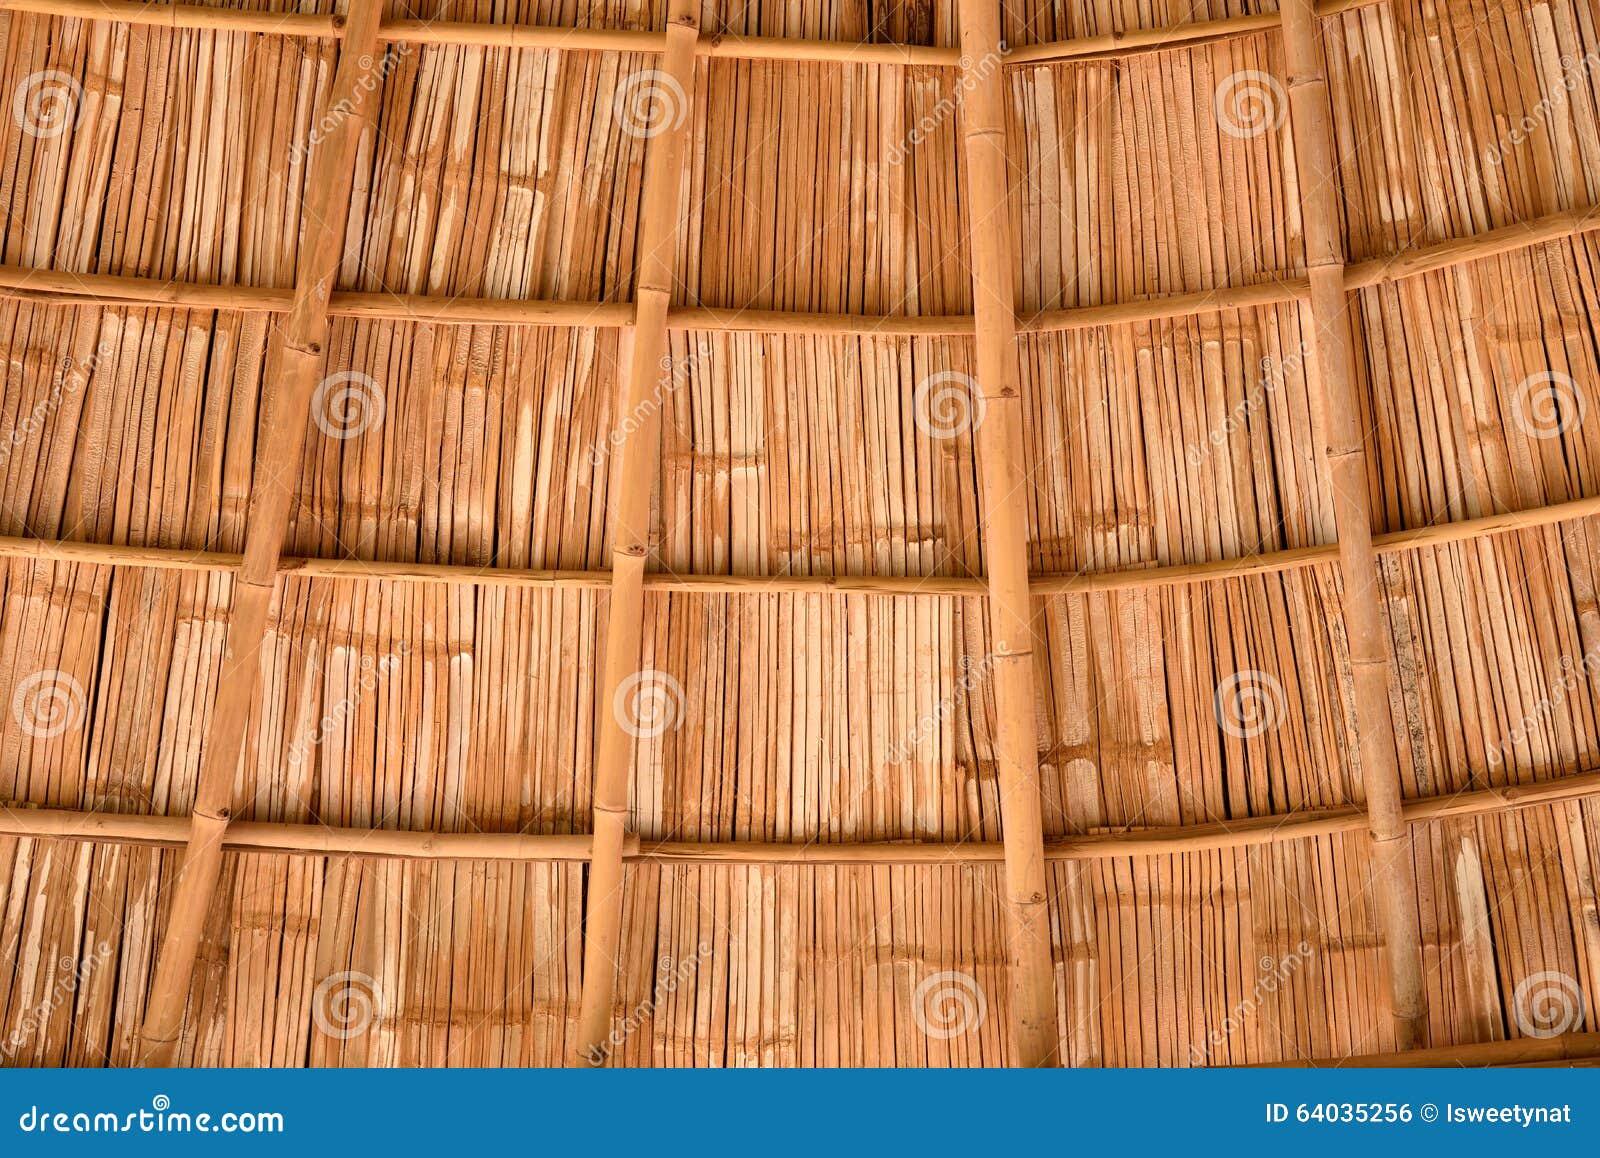 Inside A Bamboo Shingle Roof Stock Photo Image 64035256